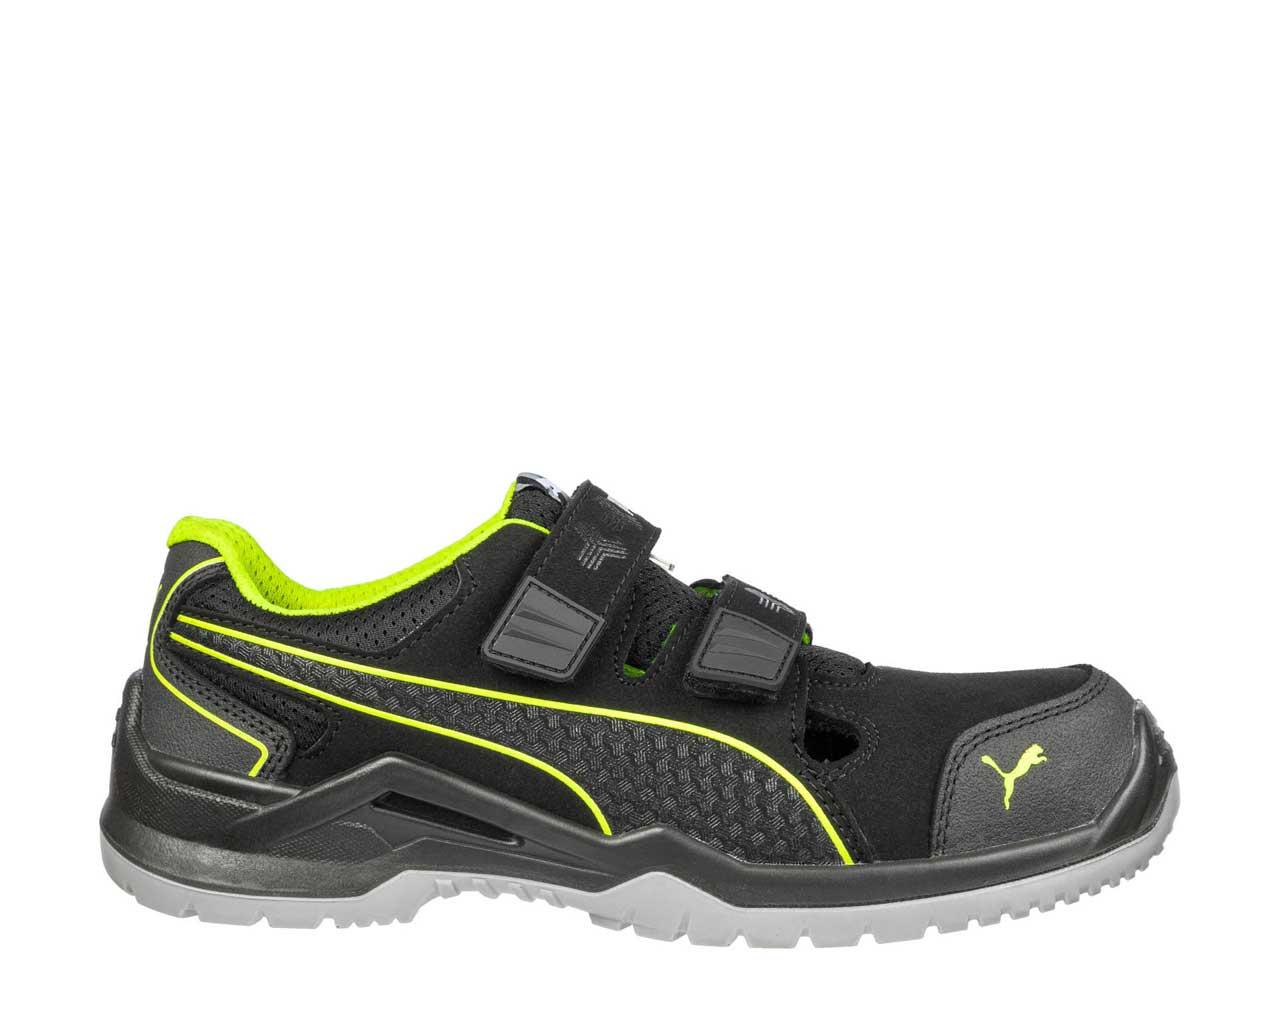 42 Business & Industrie Puma Sicherheitsschuhe Schuhe